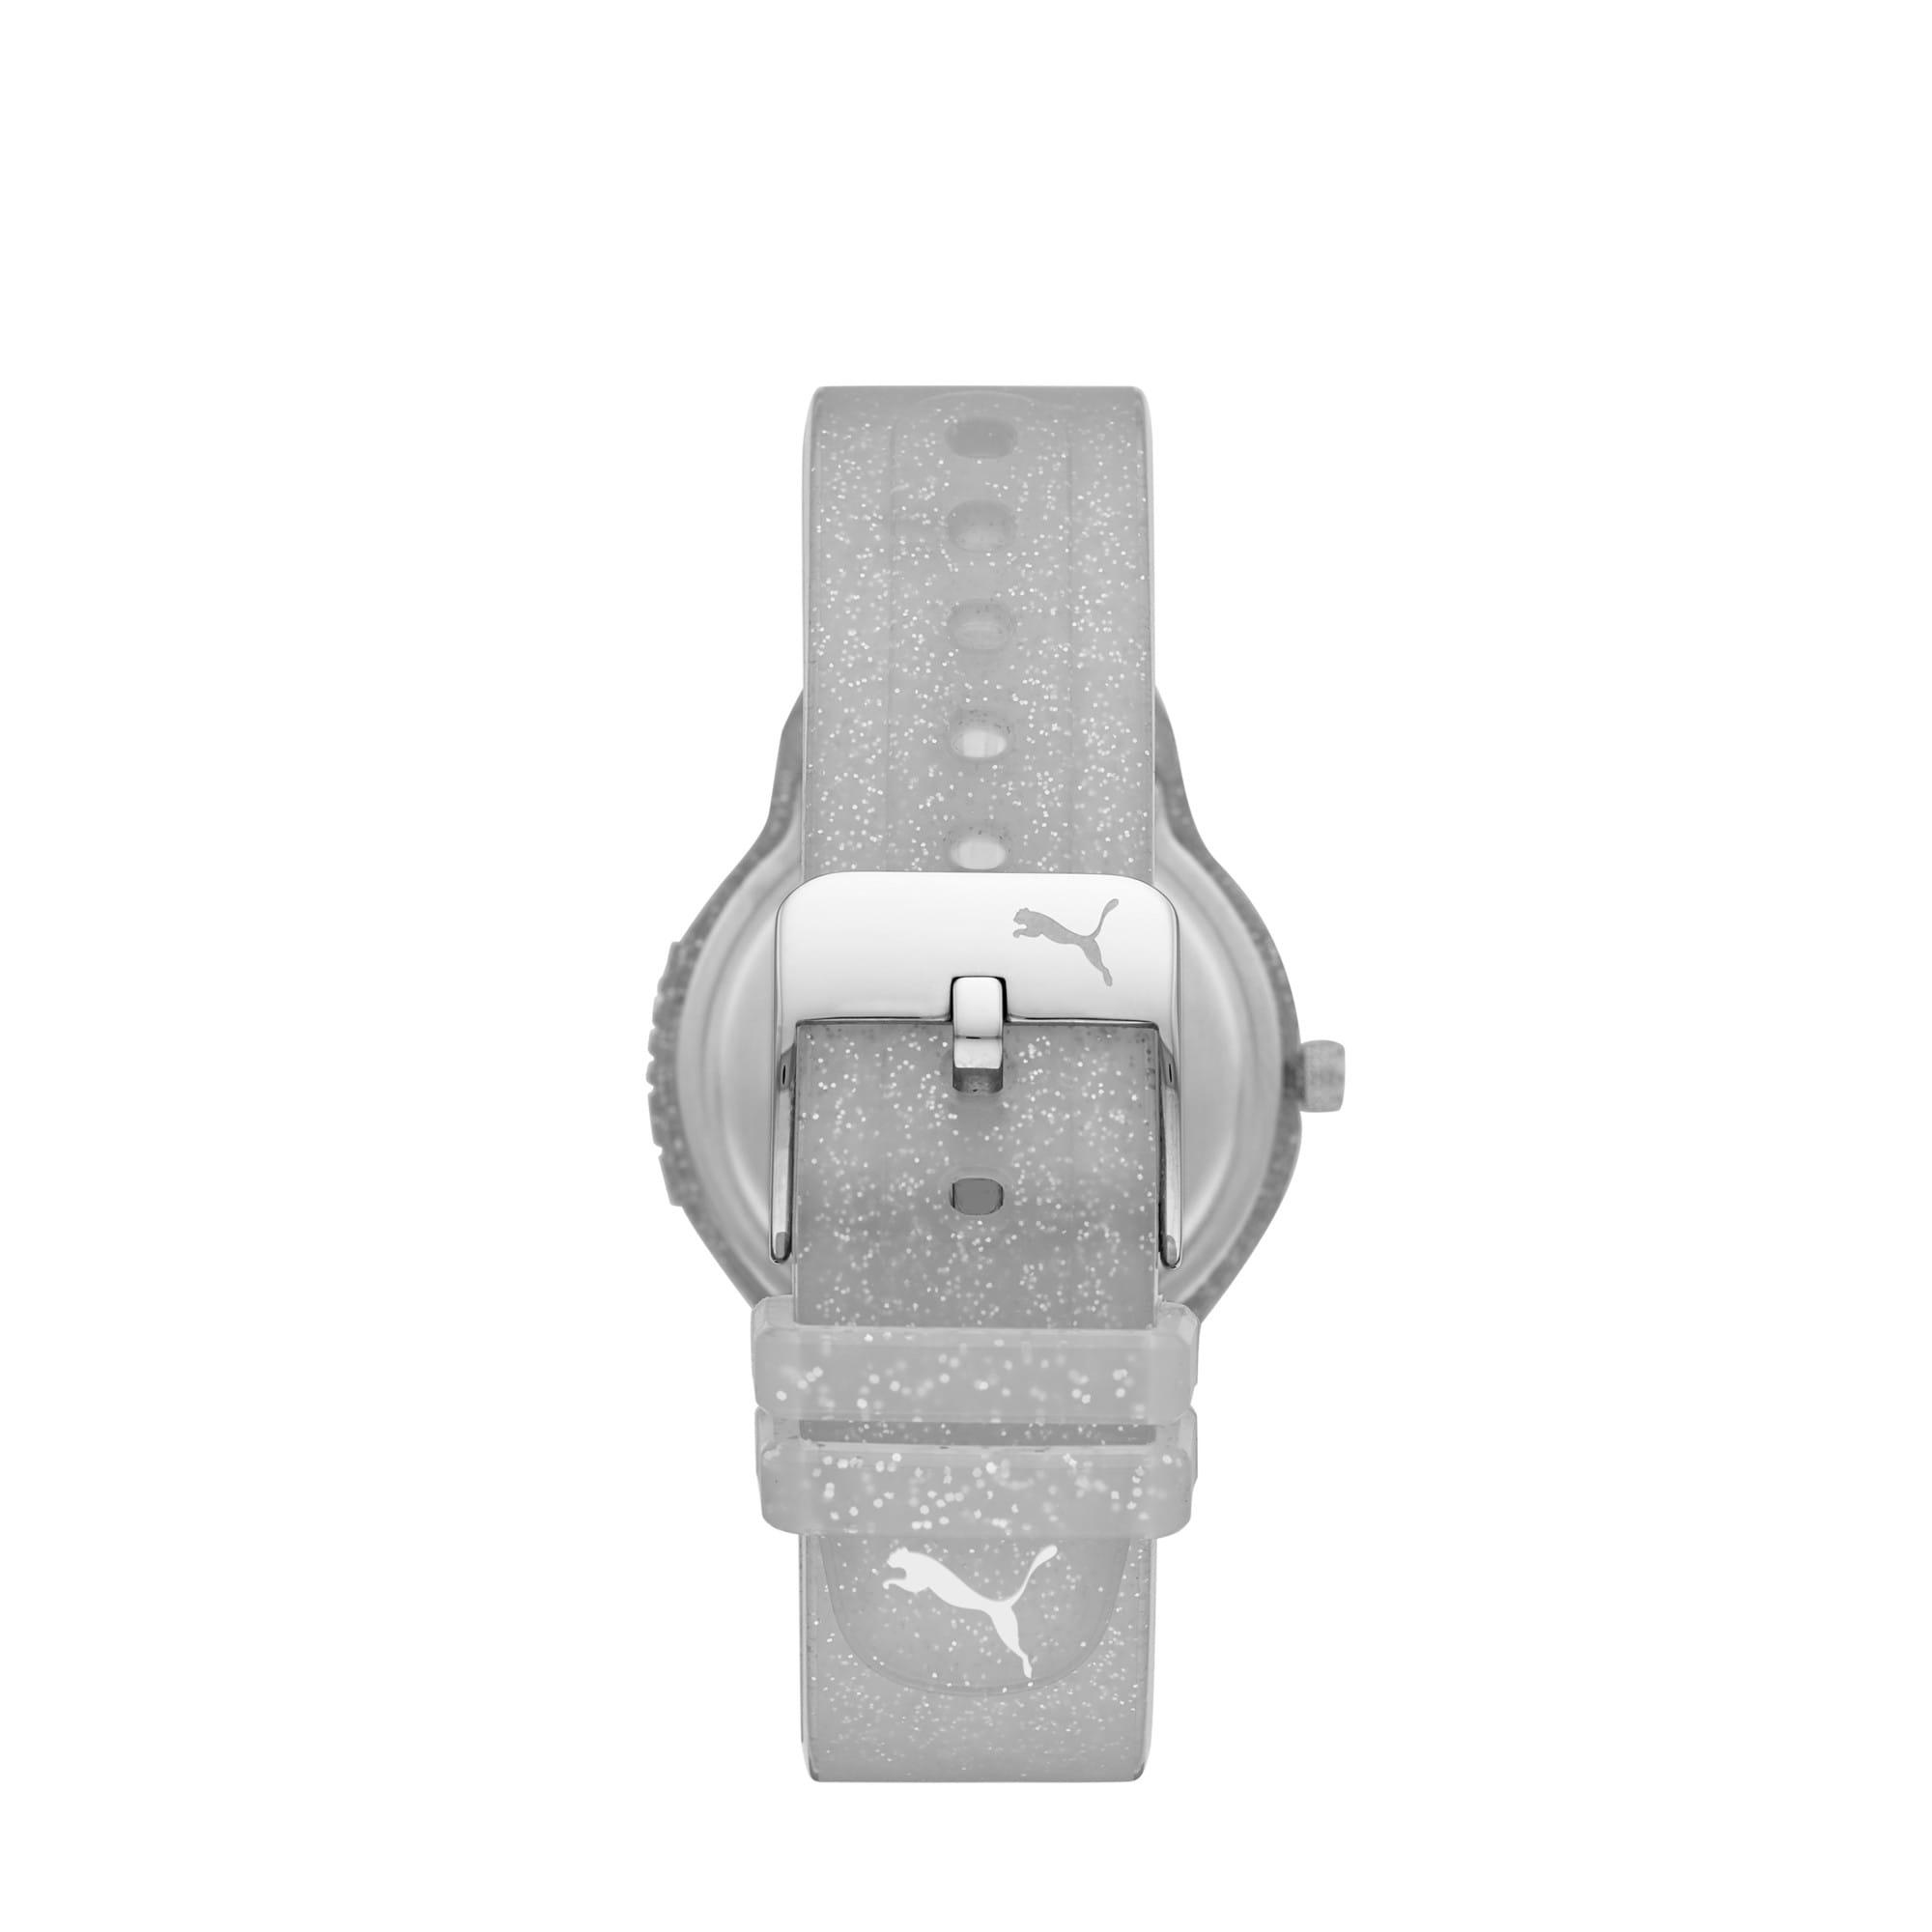 Thumbnail 2 of Reset v2 Watch, Silver/Silver, medium